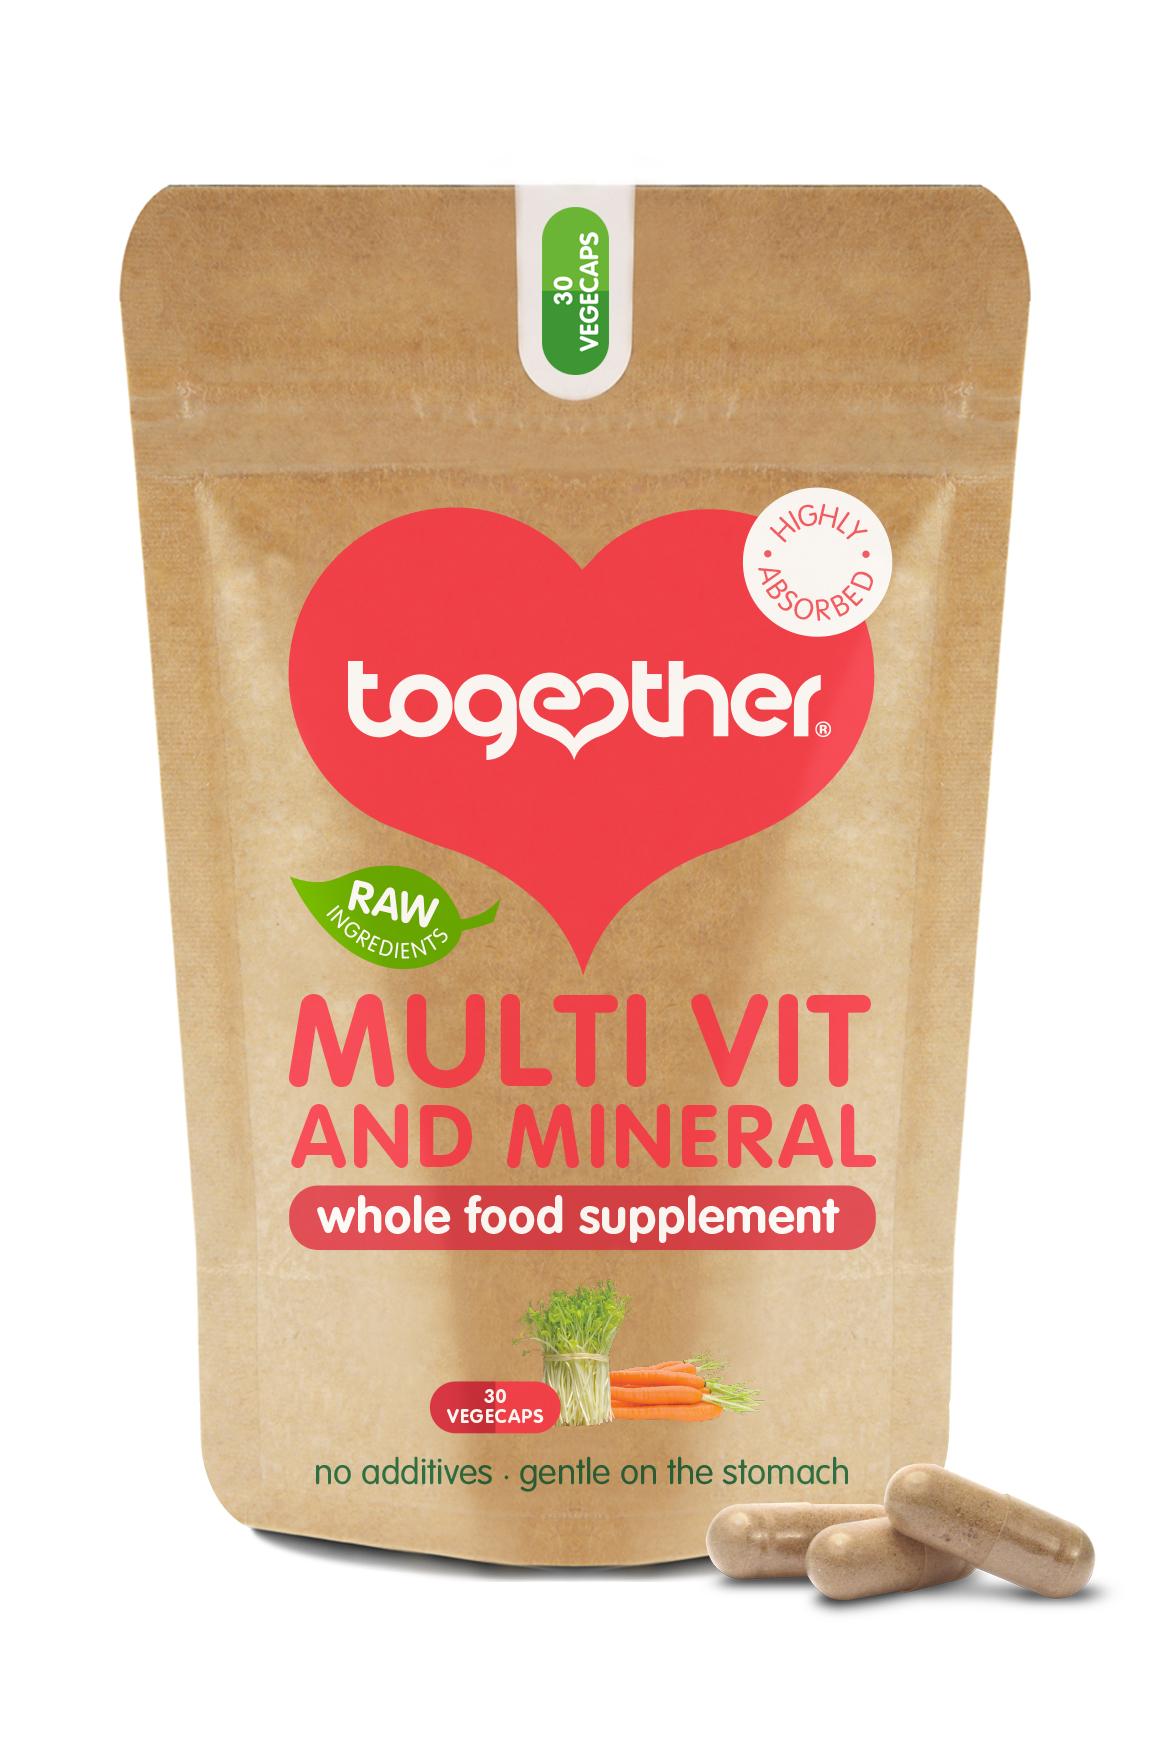 Multi Vit and Mineral 30's